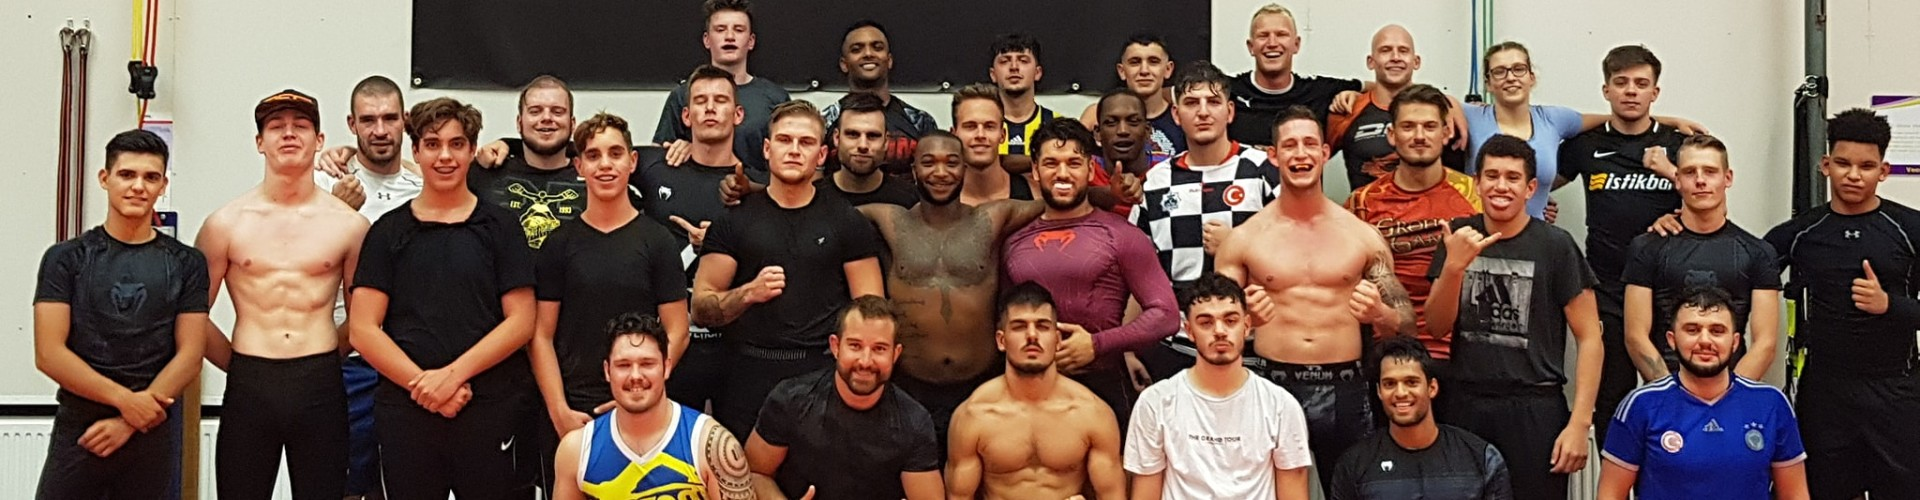 DFC Dutch Fitness & Combat